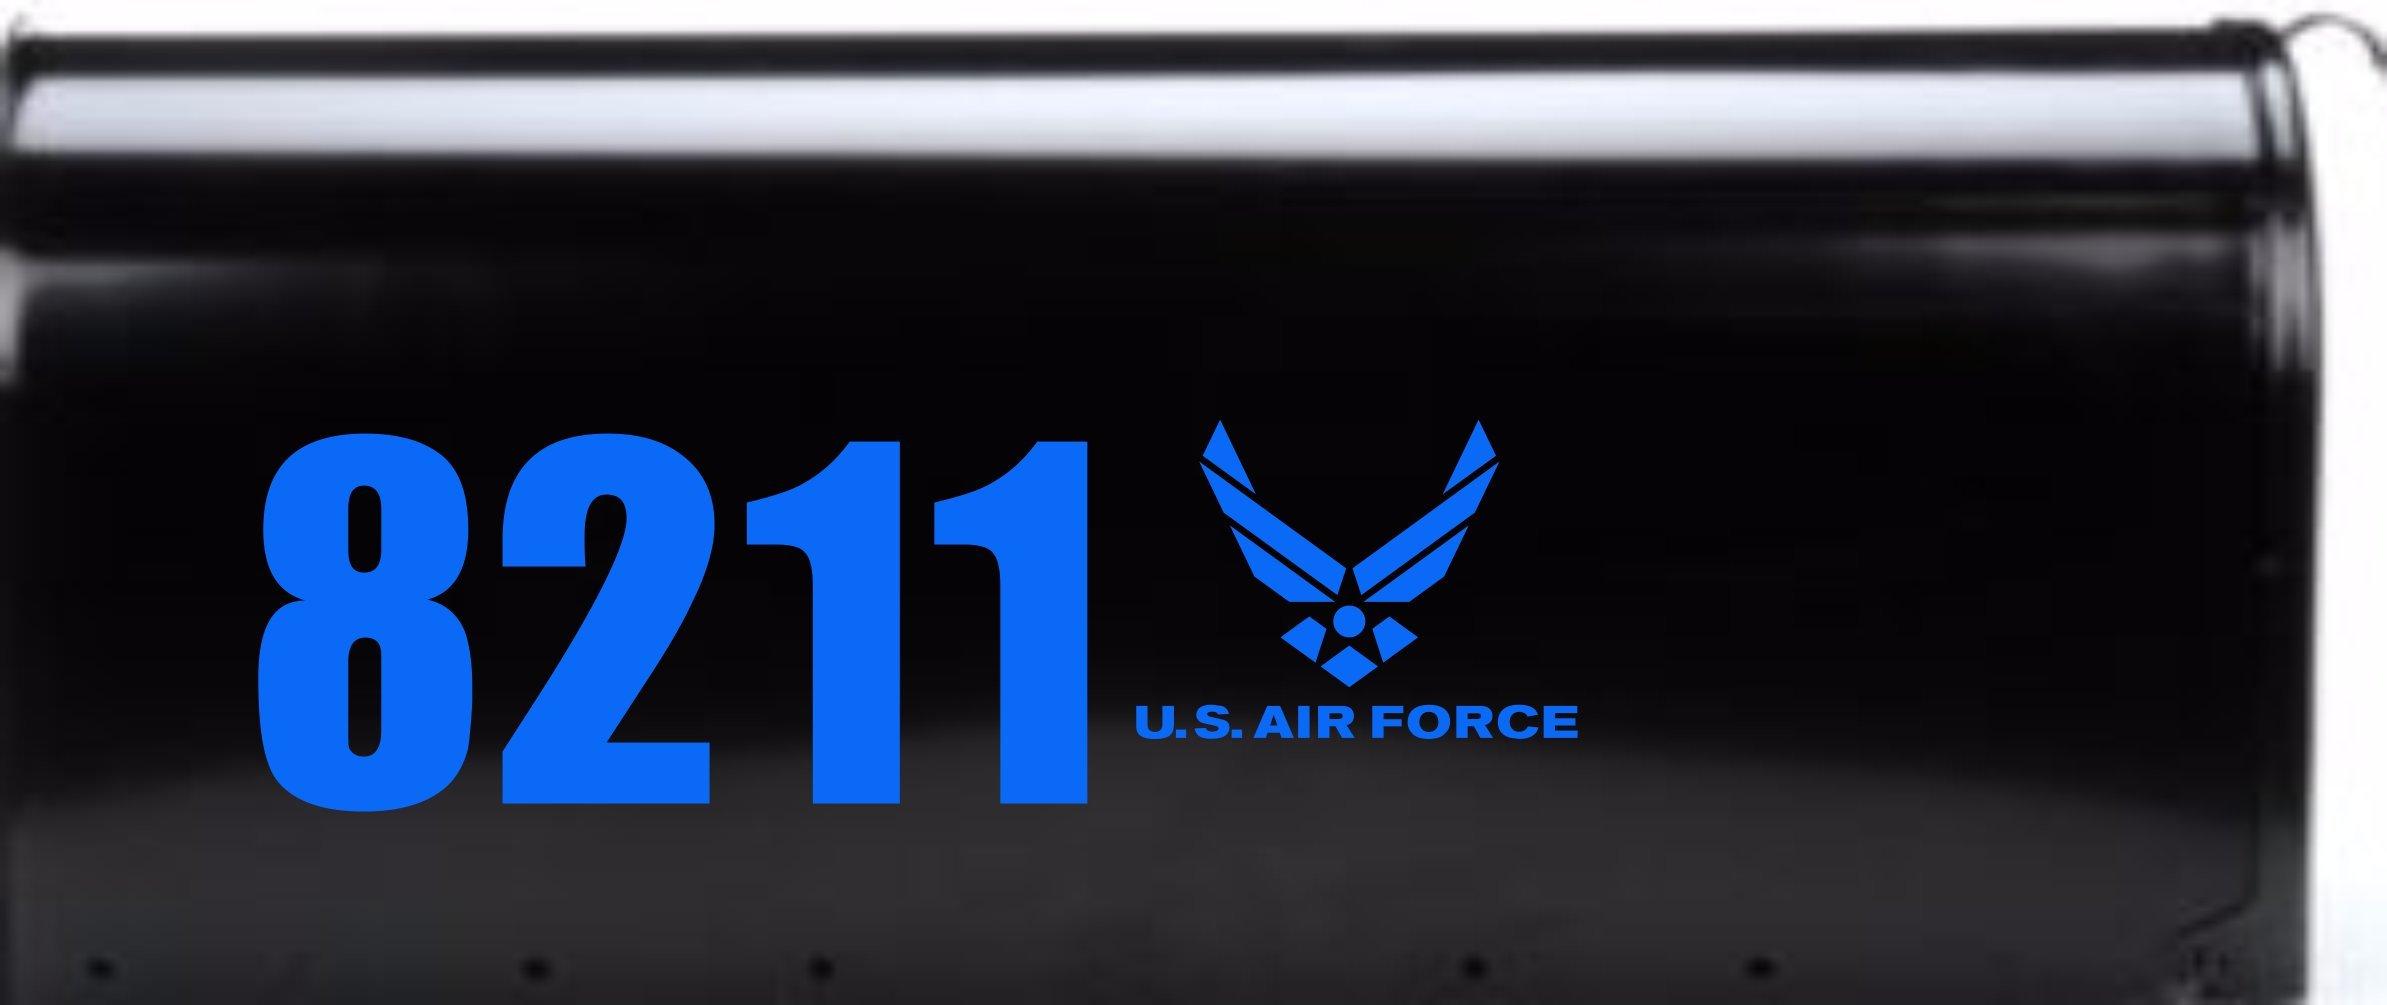 STEBEARS MAILBOX DECALS Airforce Mailbox Number Decals